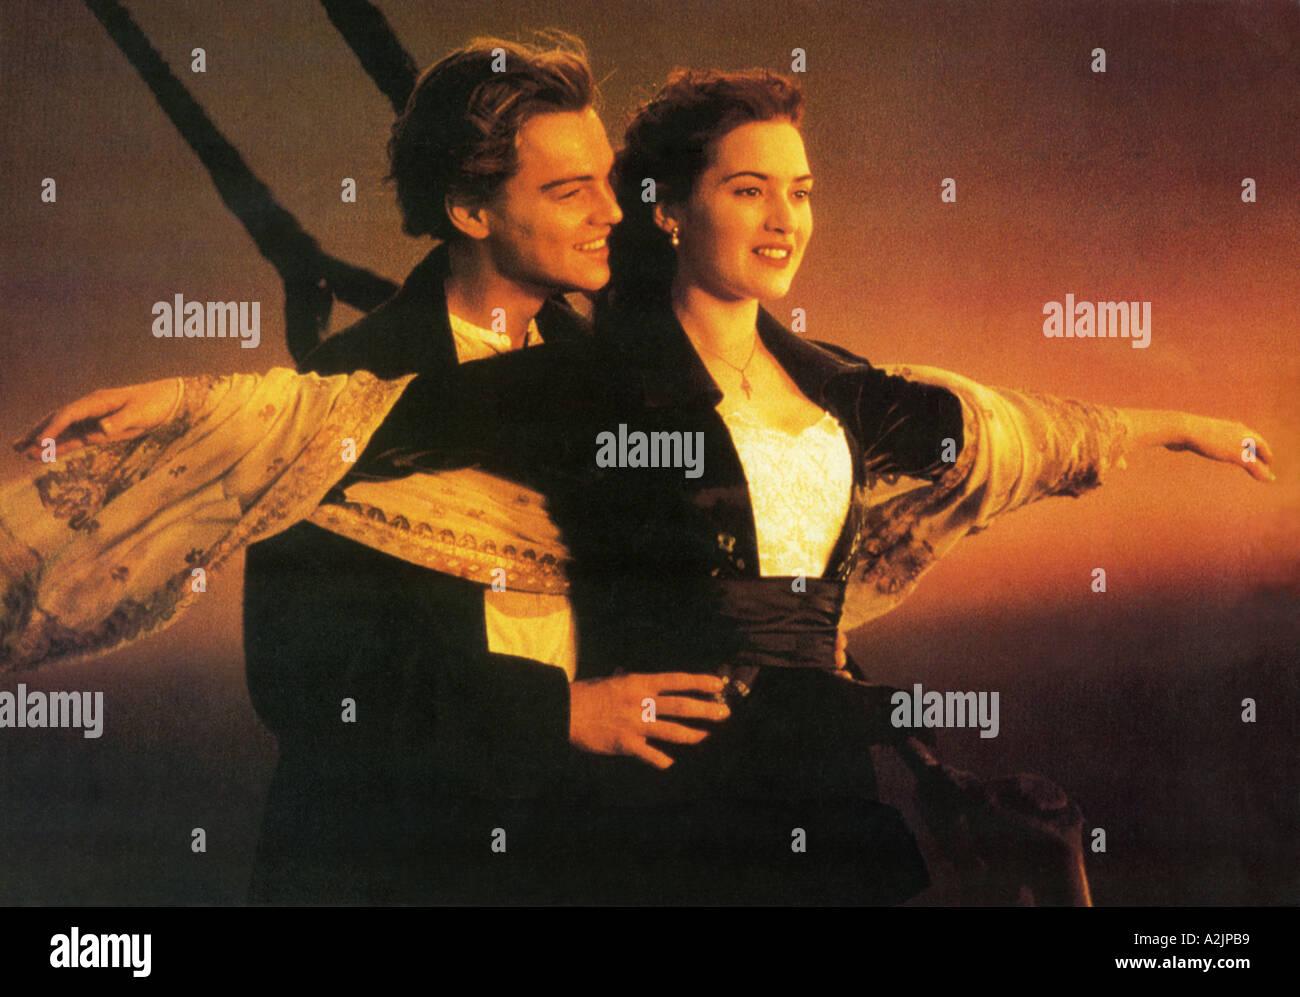 Oscar gagnant 1997 TITANIC film avec Leonardo DiCaprio et Kate Winslet Photo Stock